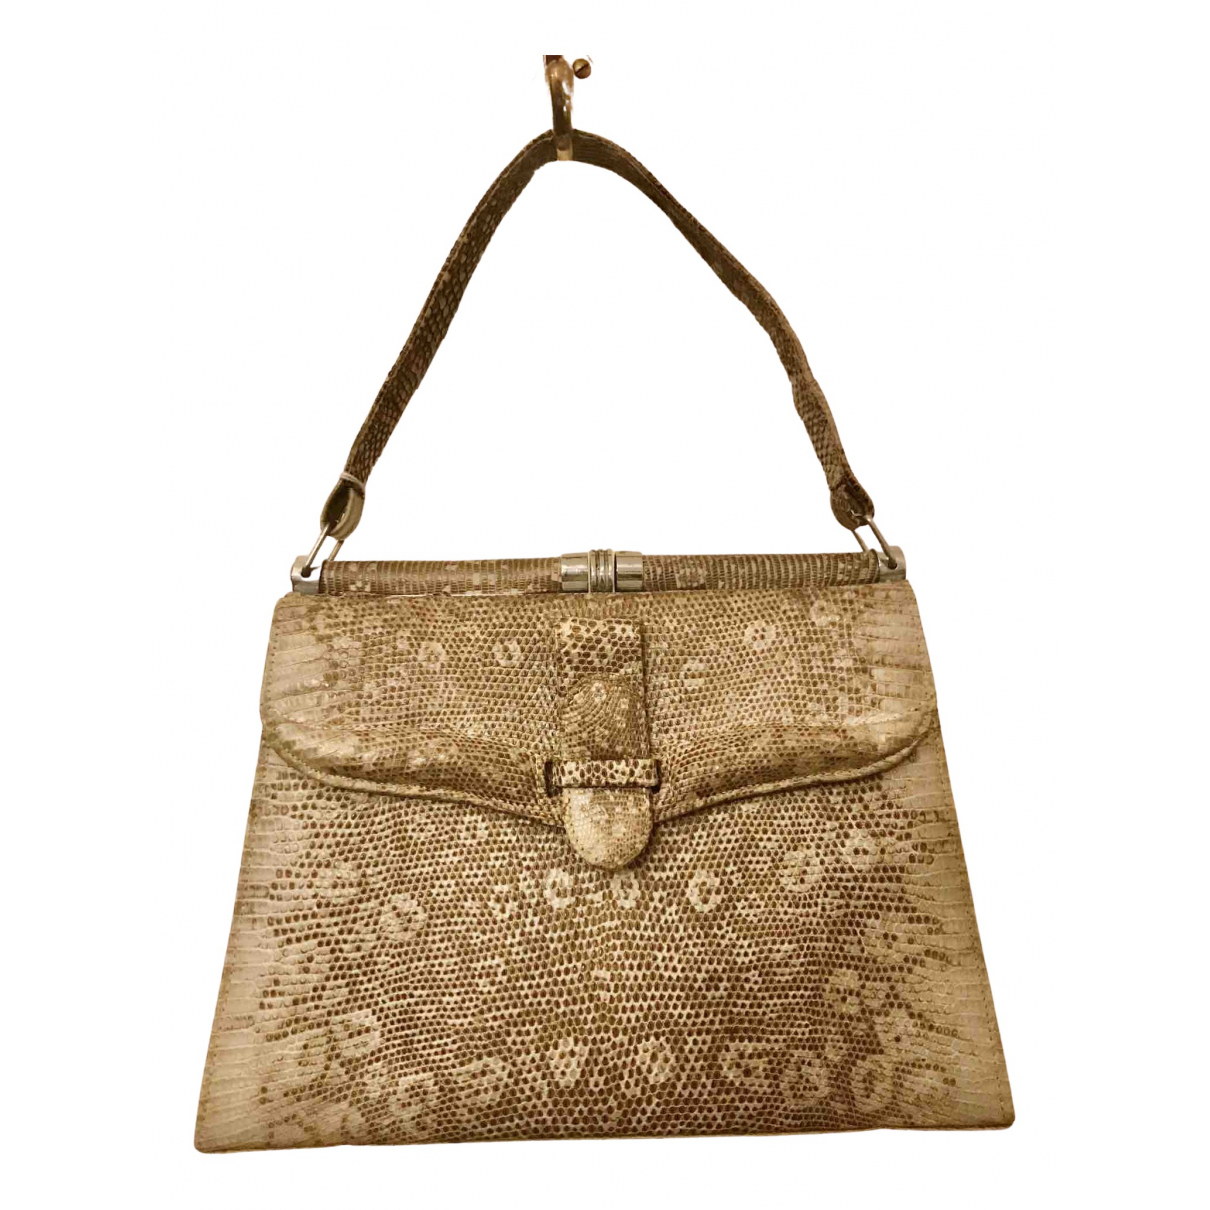 Adored Vintage N Lizard handbag for Women N